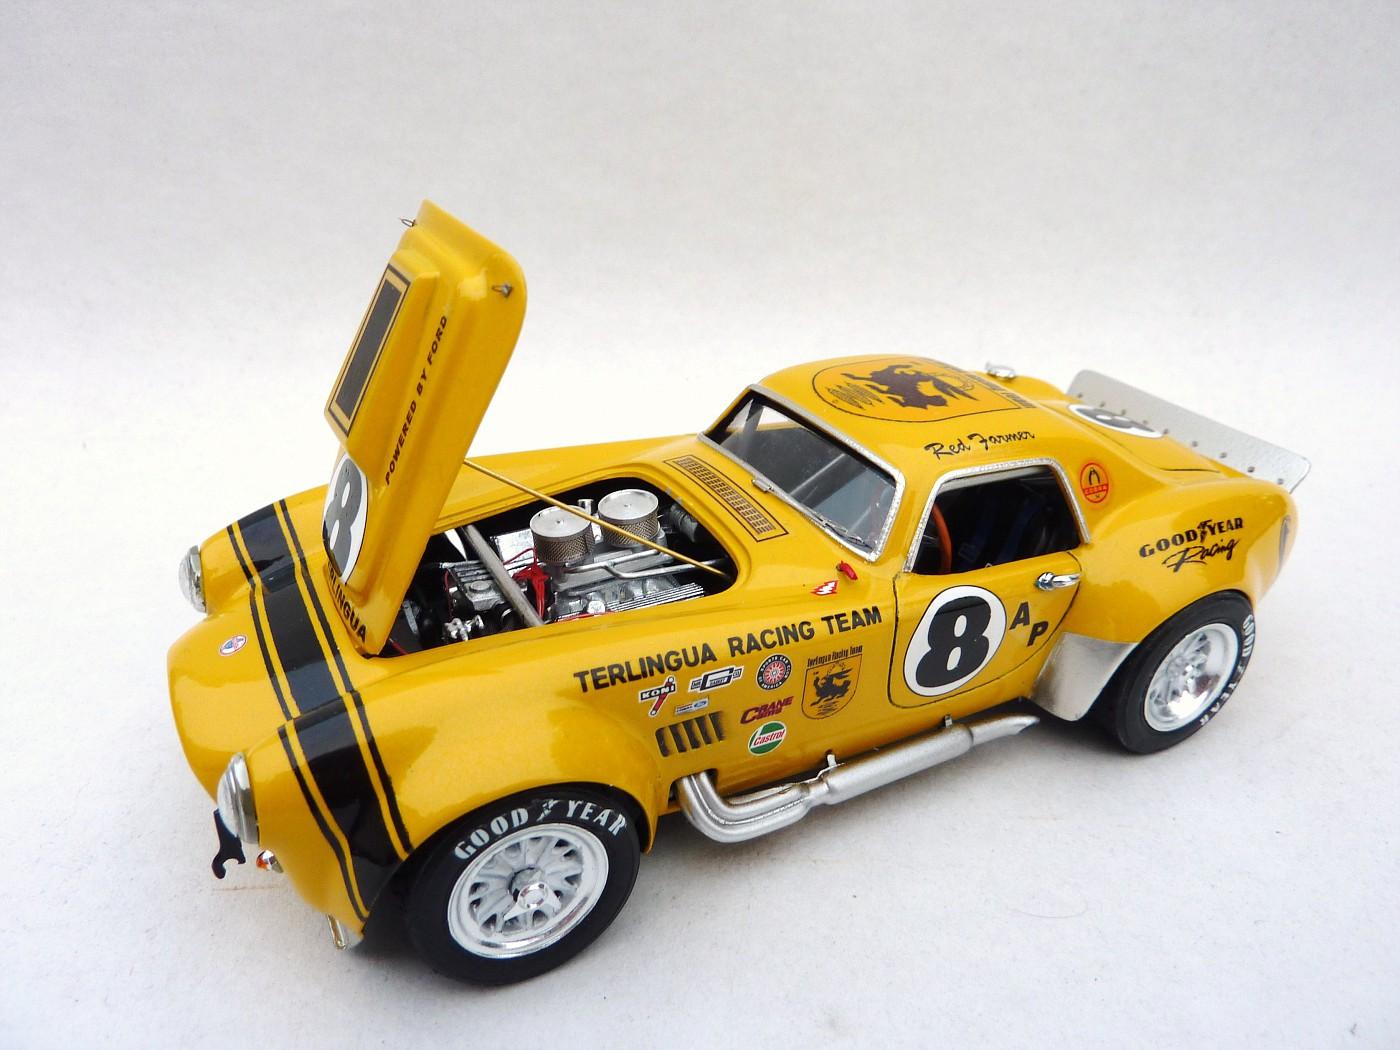 Cobra 427 terlingua racing team  PhotosfinalesCobra427evo2047-vi